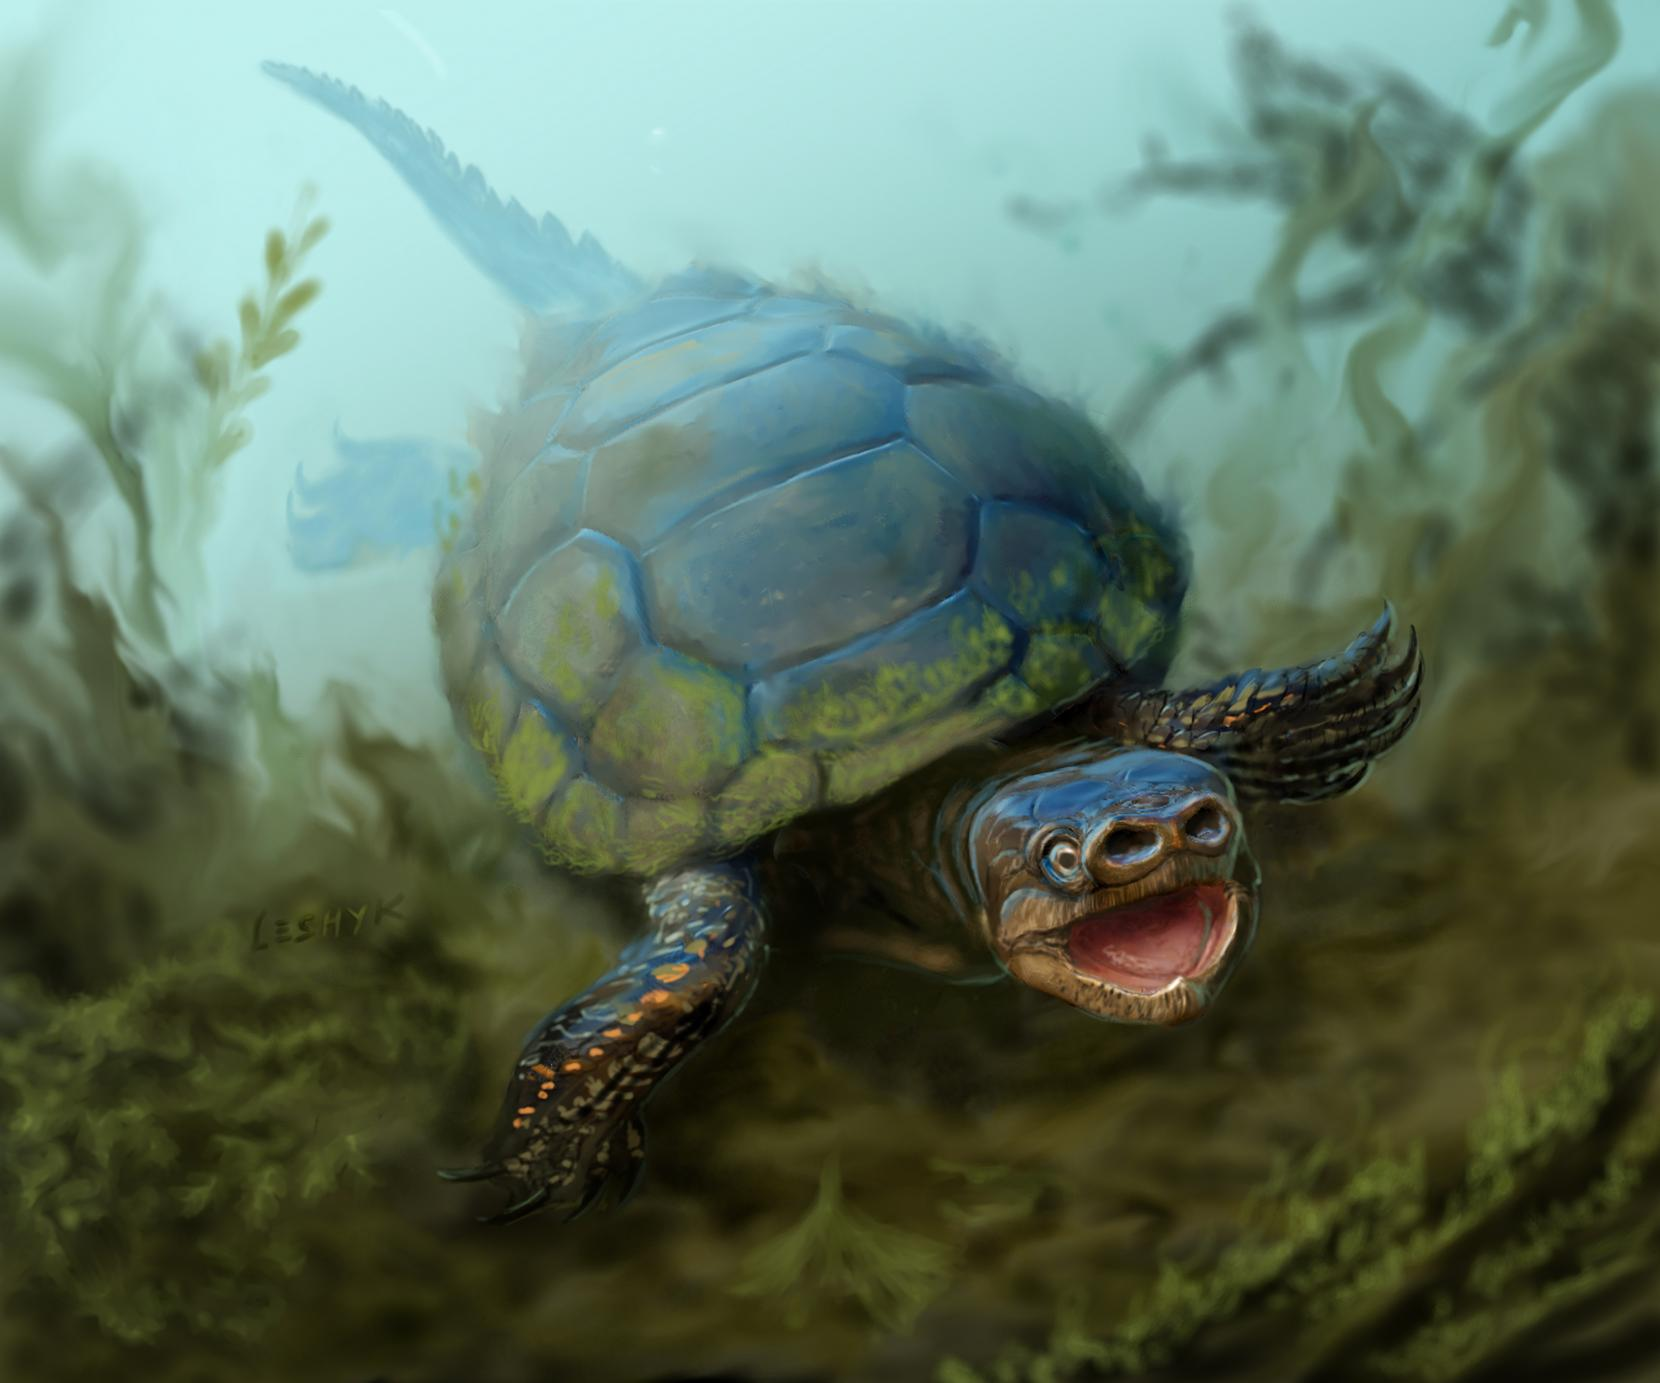 An artist's interpretation of Arvinachelys goldeni, a species of extinct pig-nose turtle.